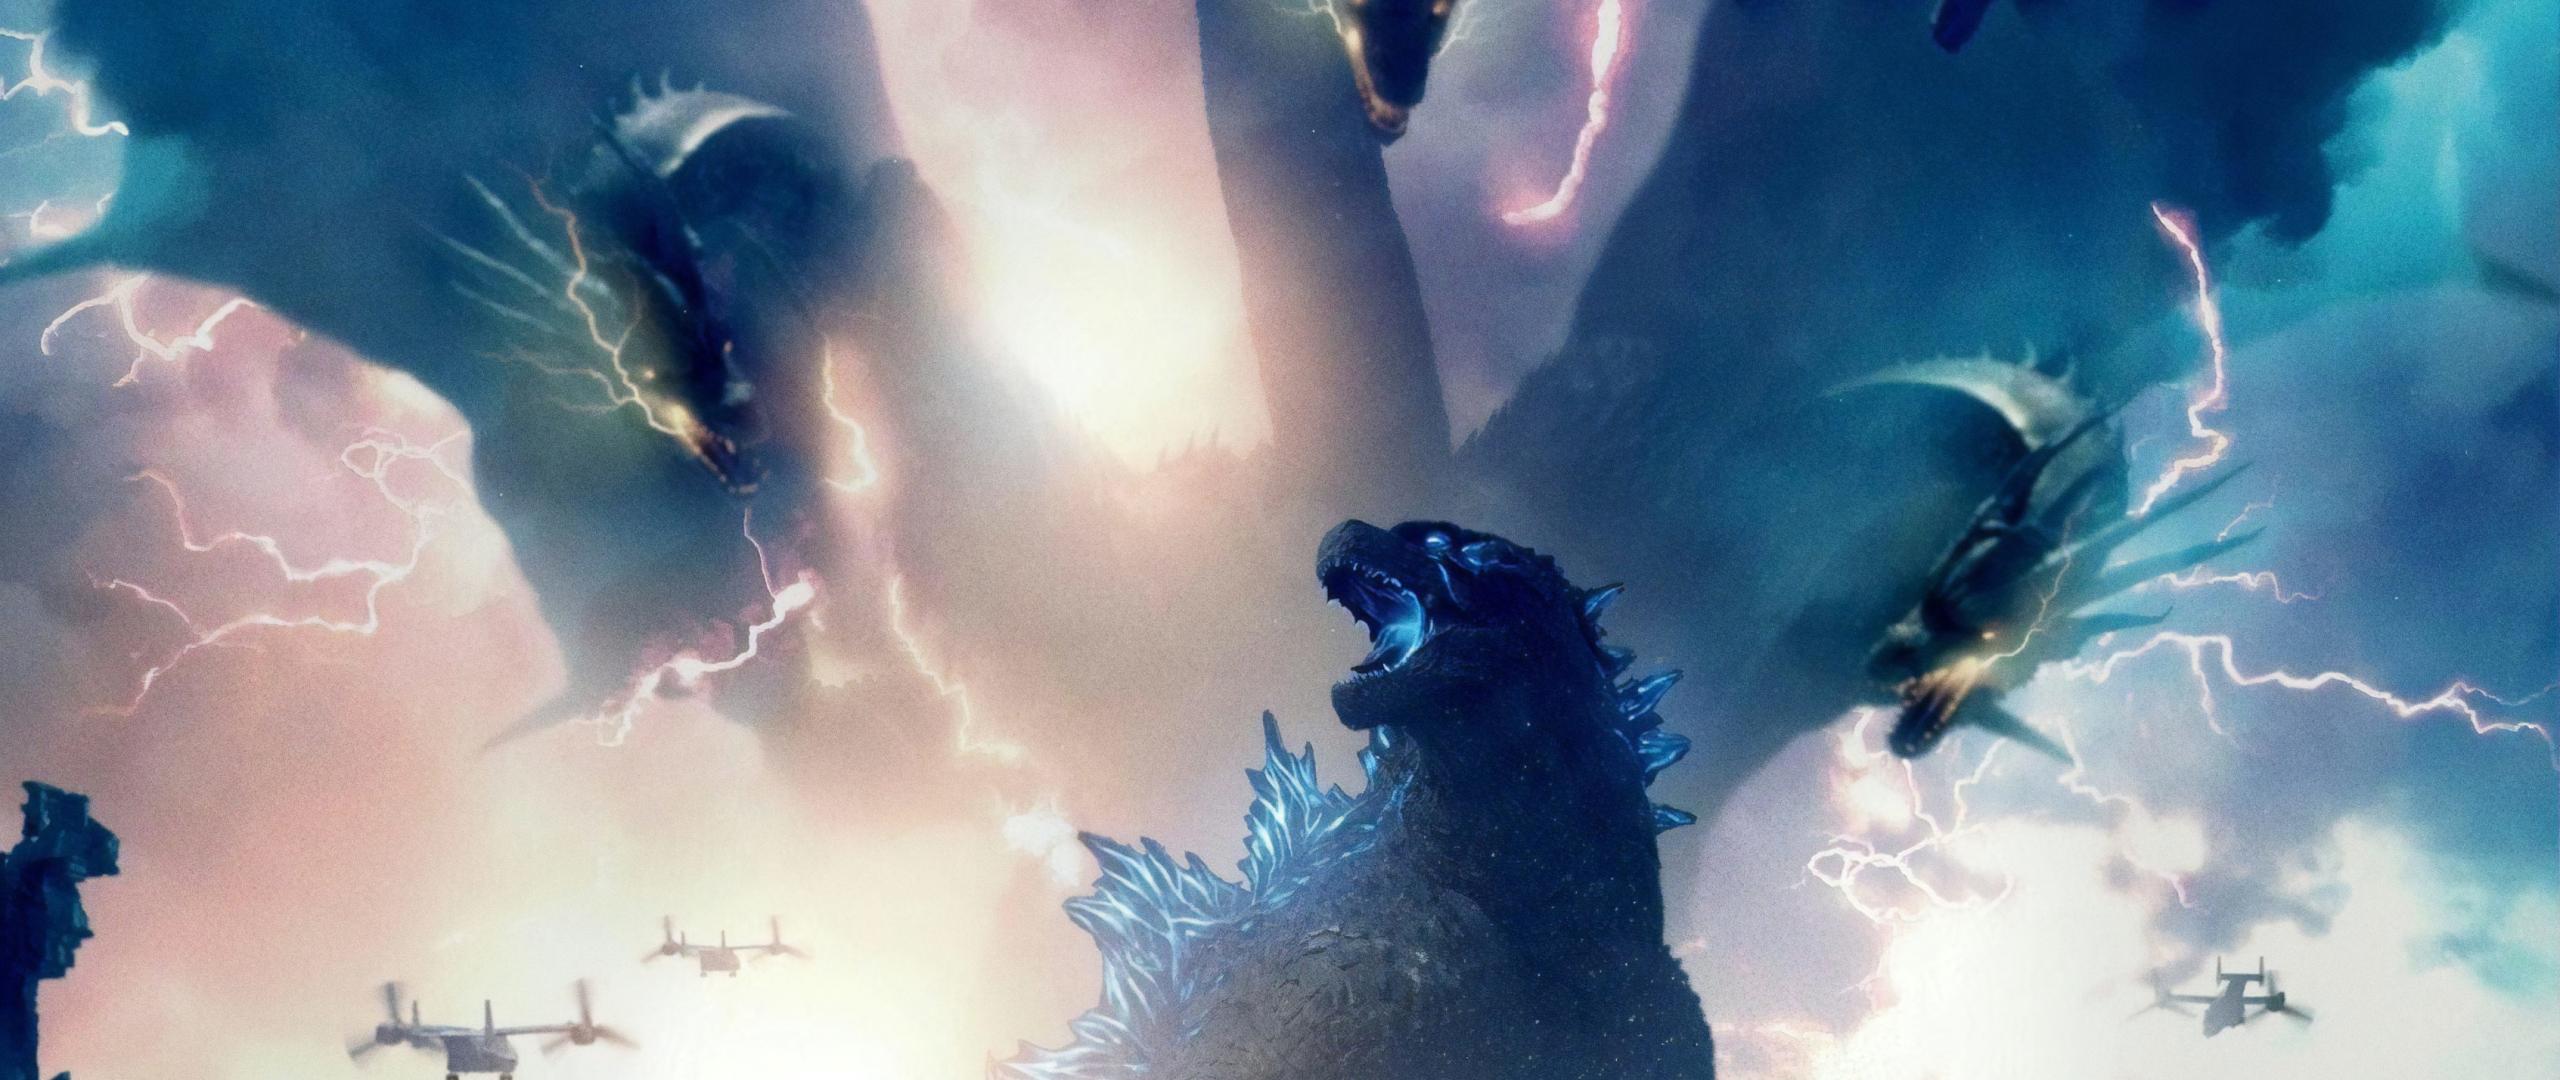 2560x1080 Godzilla King Of The Monsters Movie 2019 2560x1080